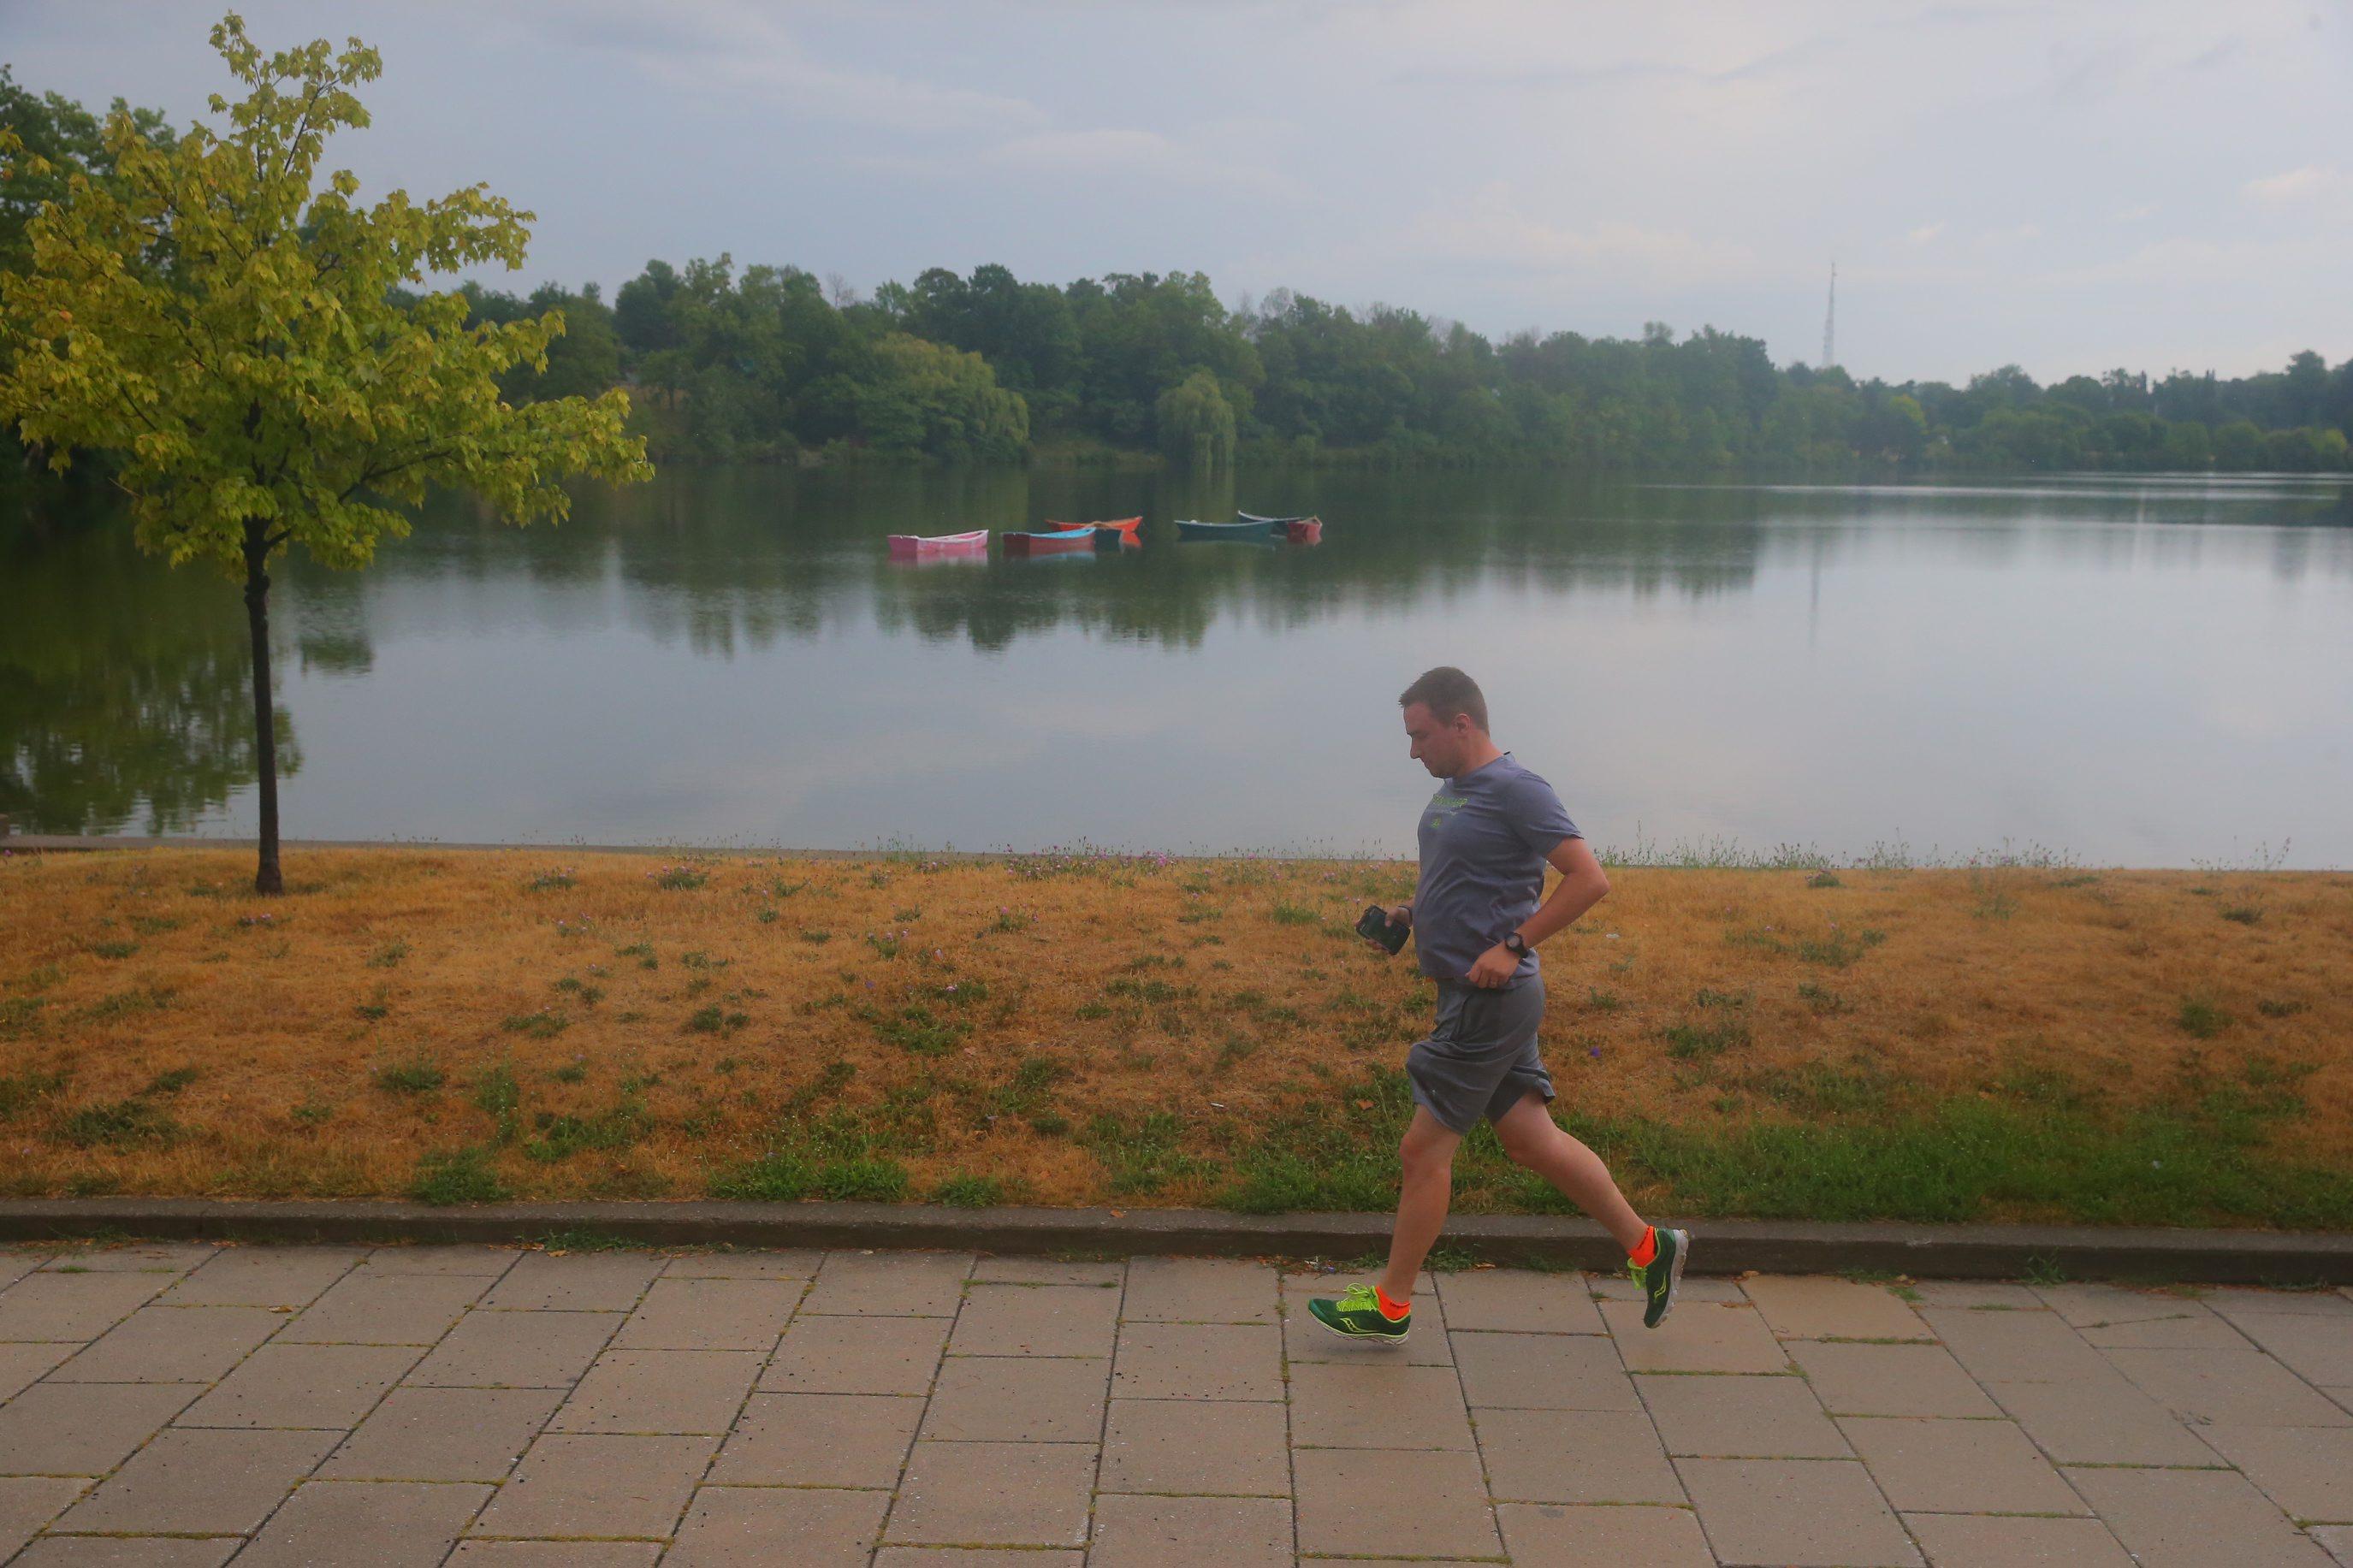 A jogger runs by Hoyt Lake at Delaware Park as a light rain falls in Buffalo on Monday.  (John Hickey/Buffalo News)